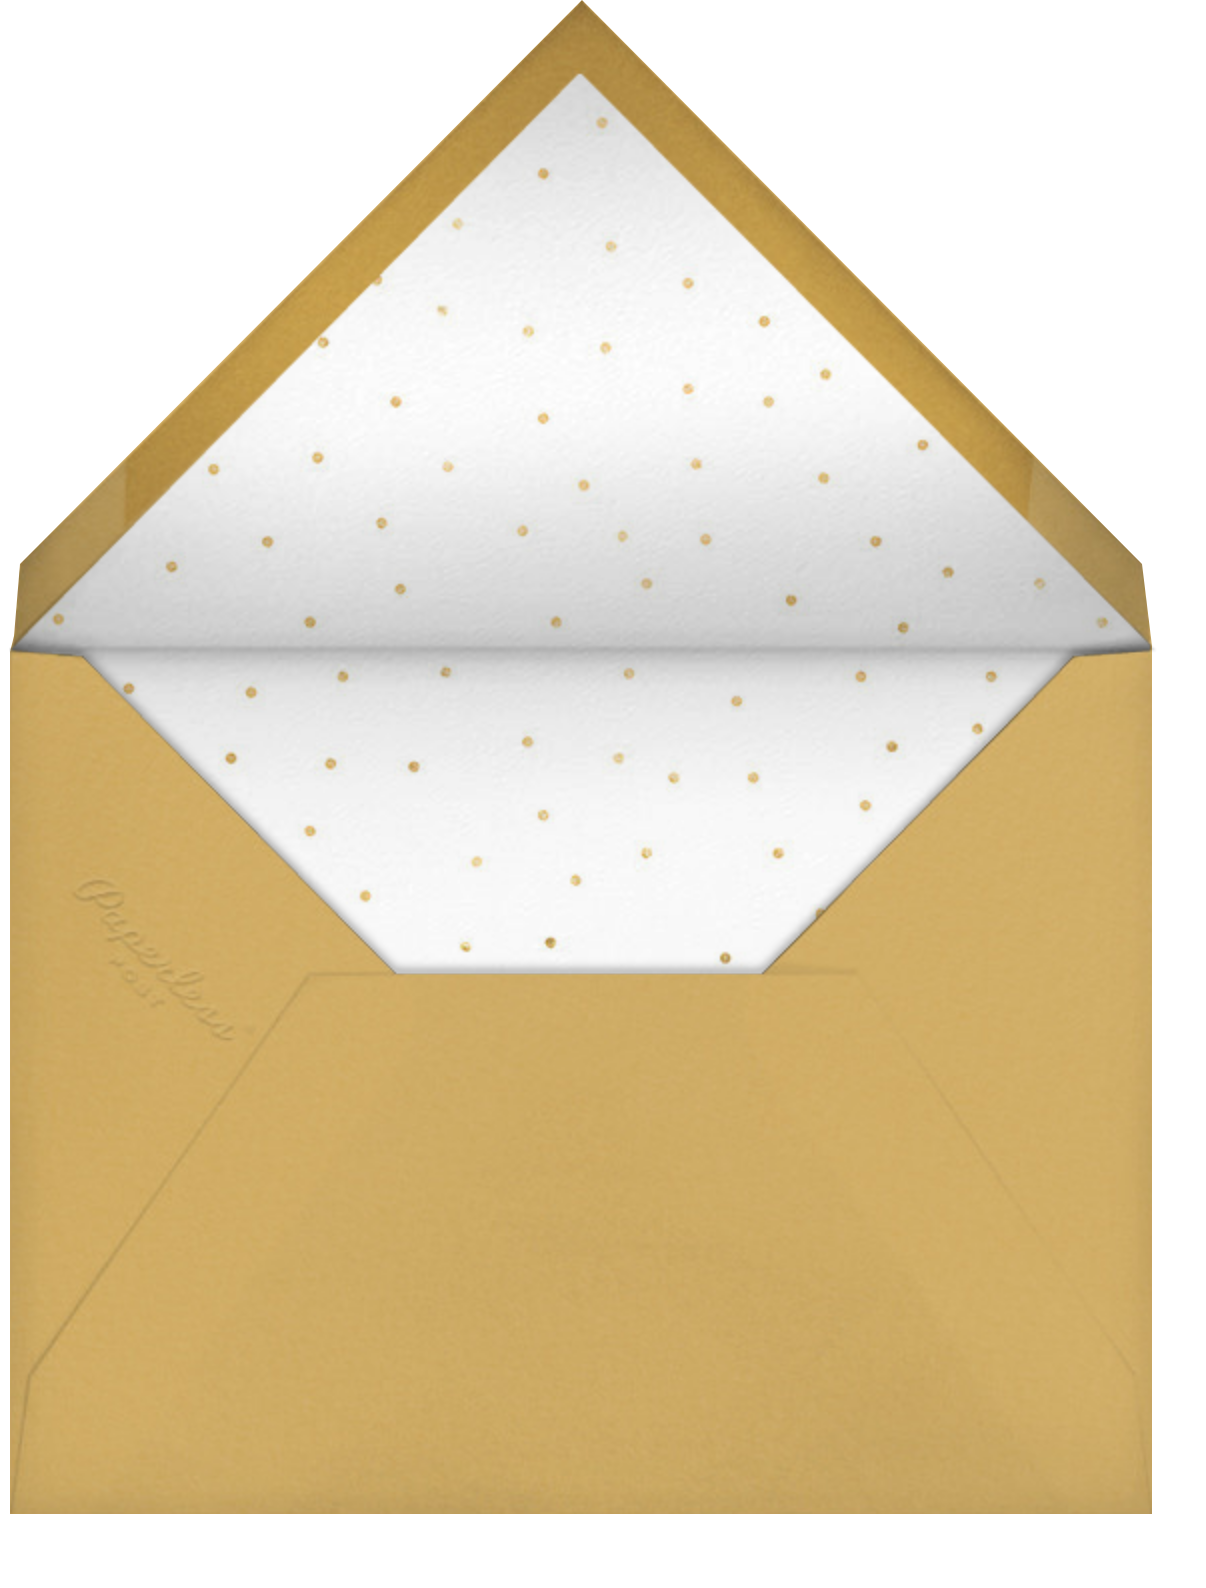 Tartan Soirée - Sugar Paper - Corporate invitations - envelope back